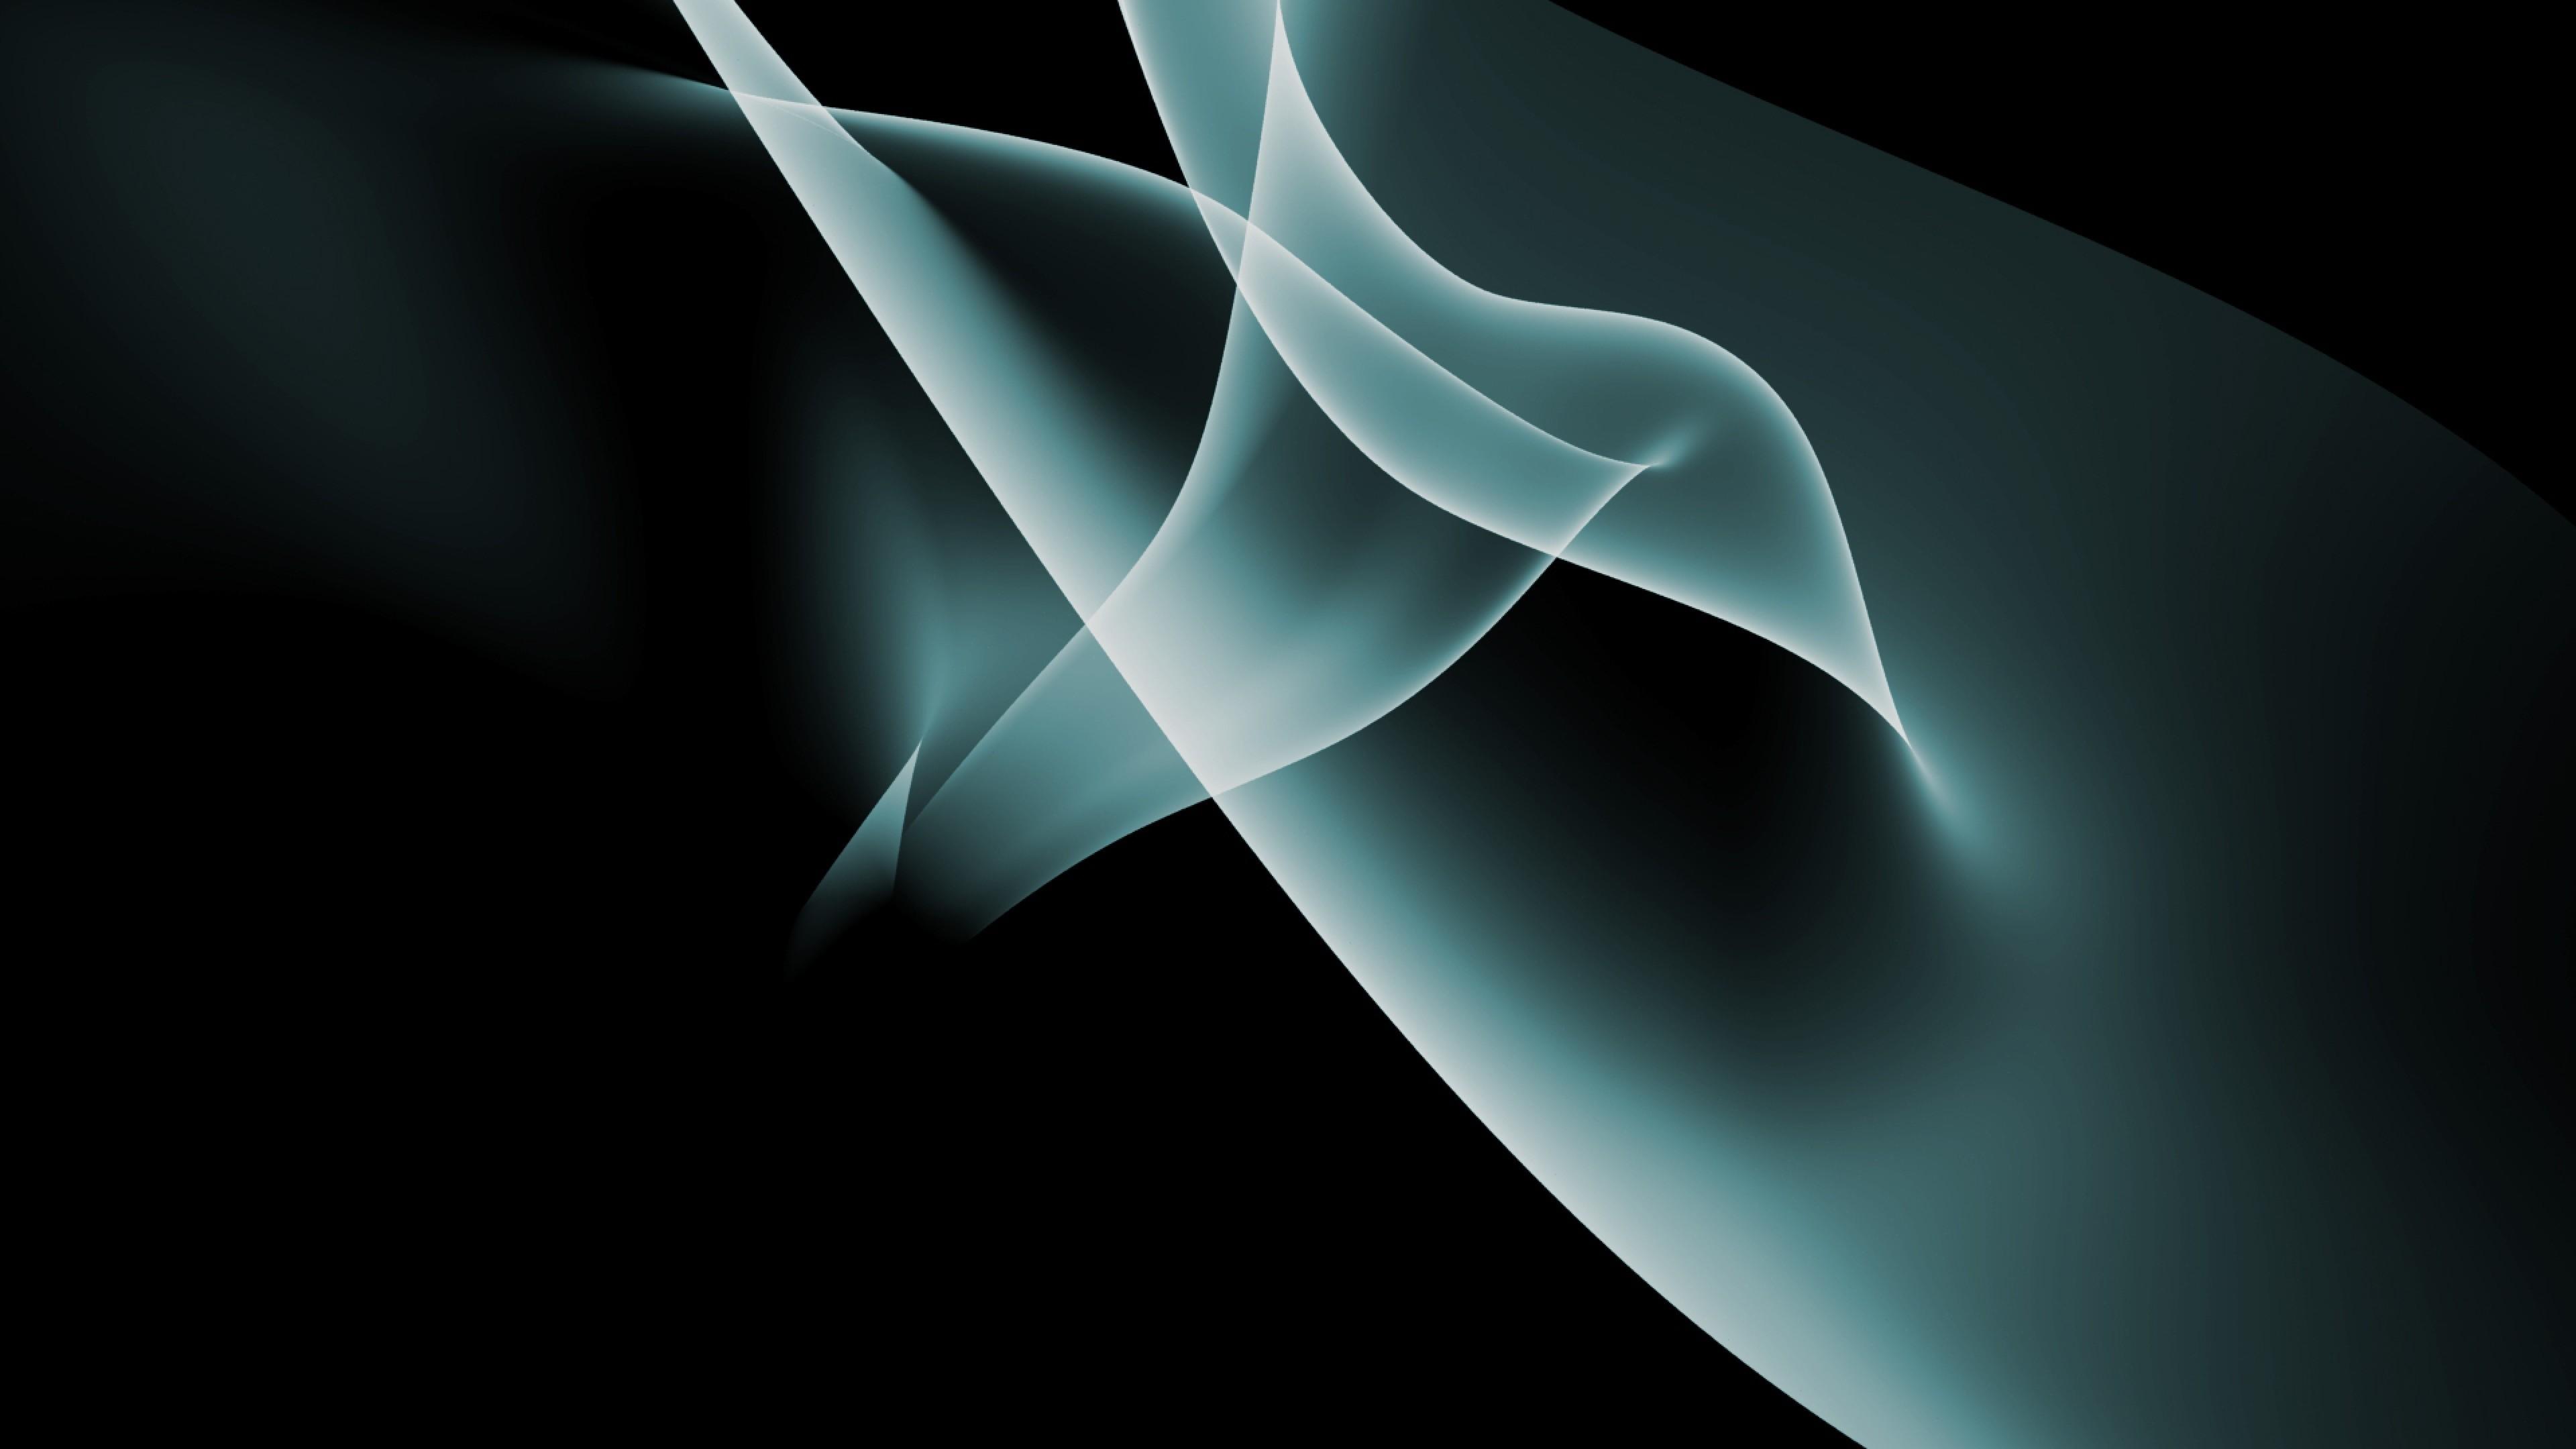 Wallpaper line, smoke, veil, shadows, light